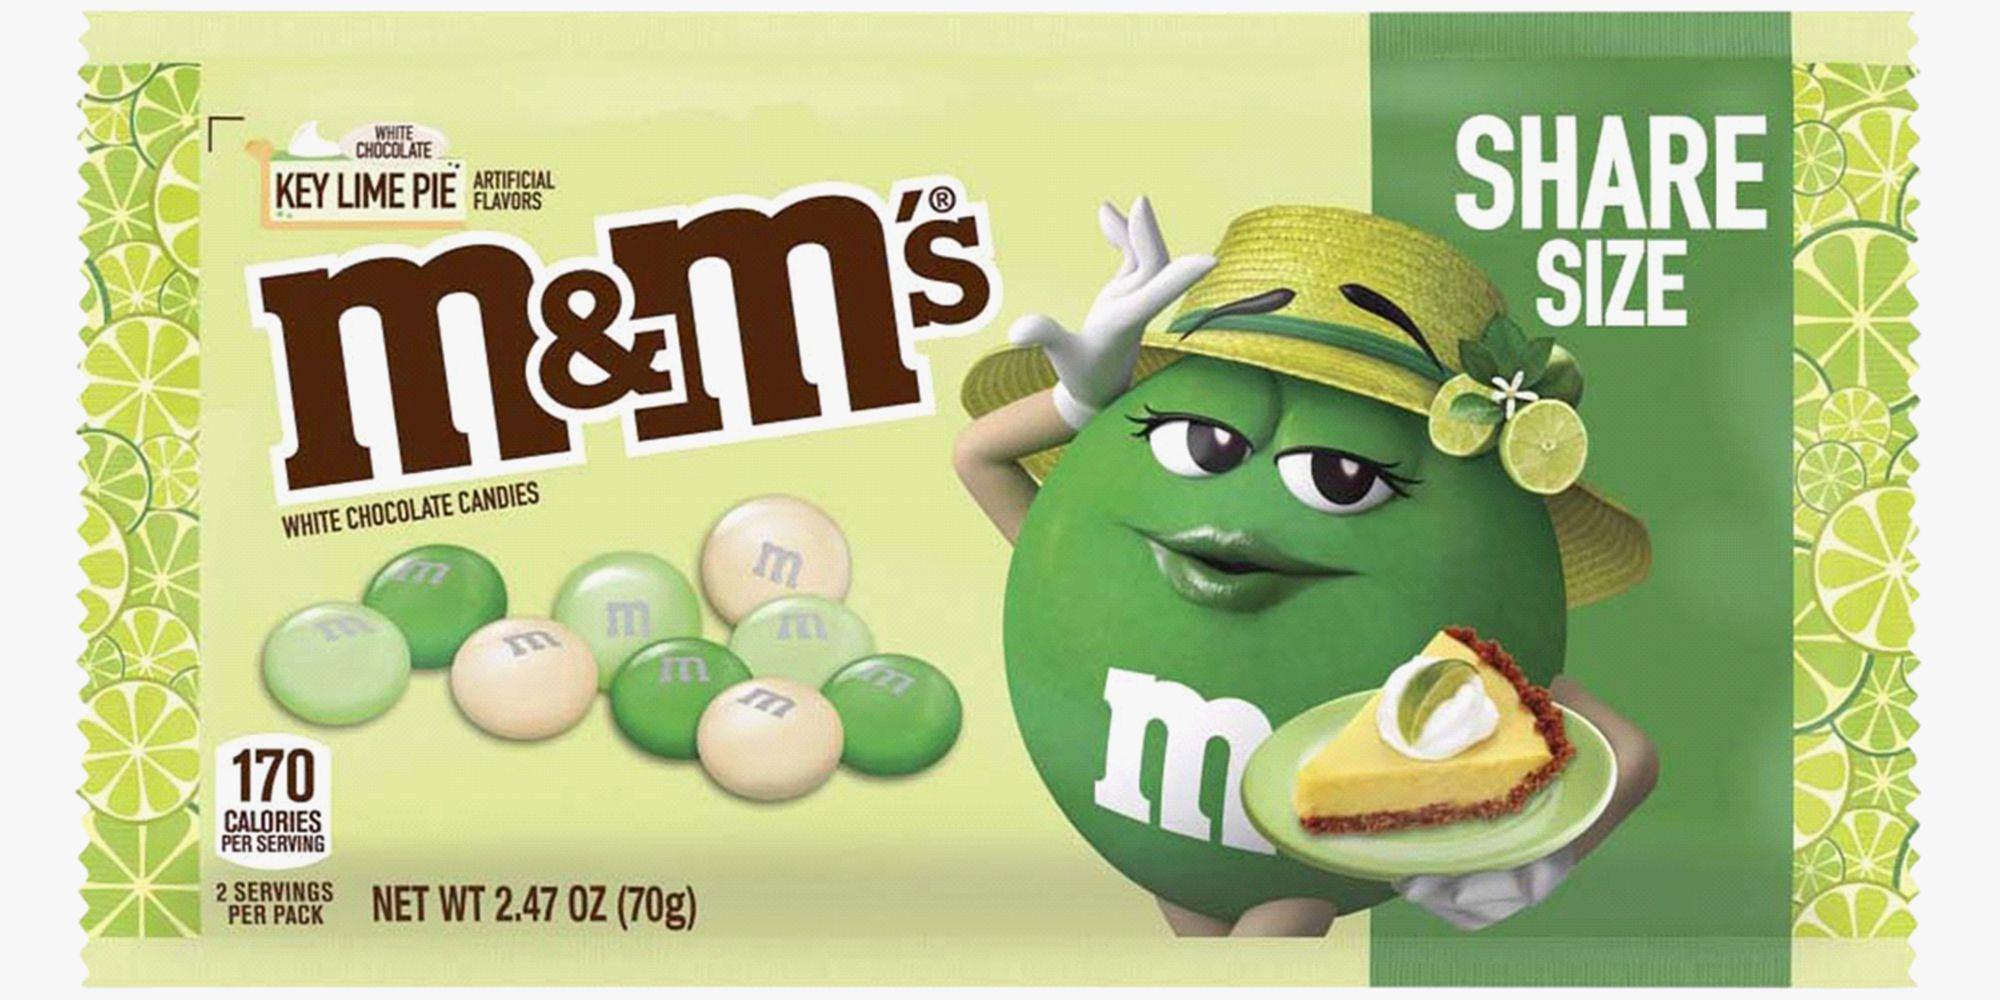 M&M's Is Releasing a Key Lime Pie Taste That Will